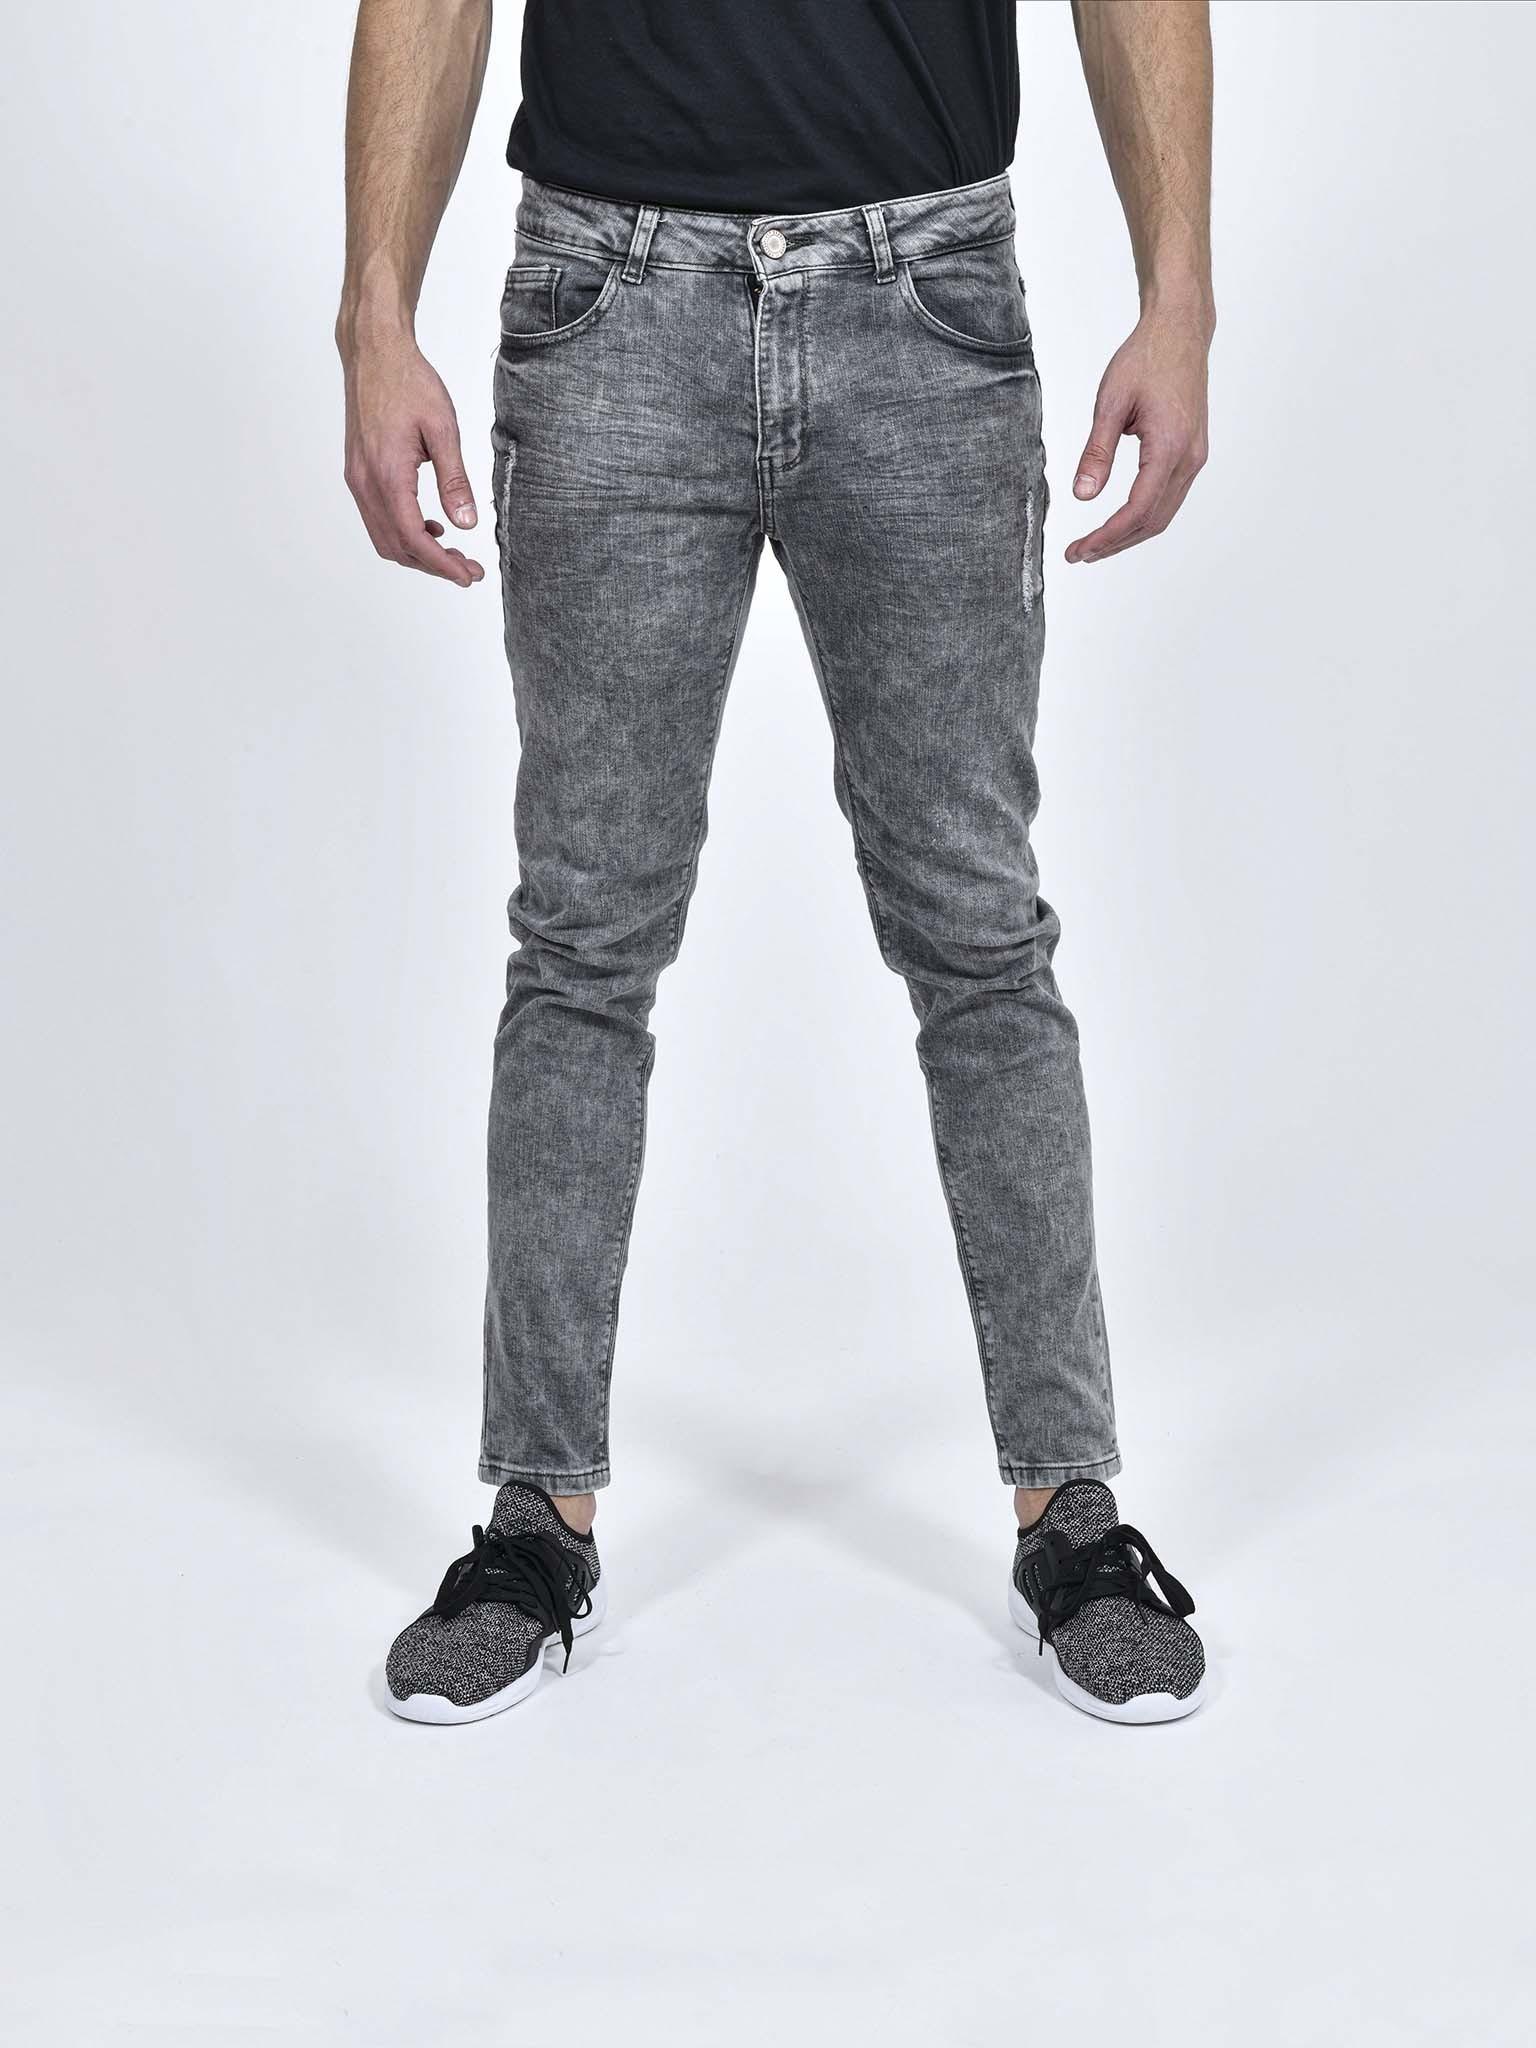 Anonimo Copiar Tempo Jeans Deslavados Hombre Ocmeditation Org